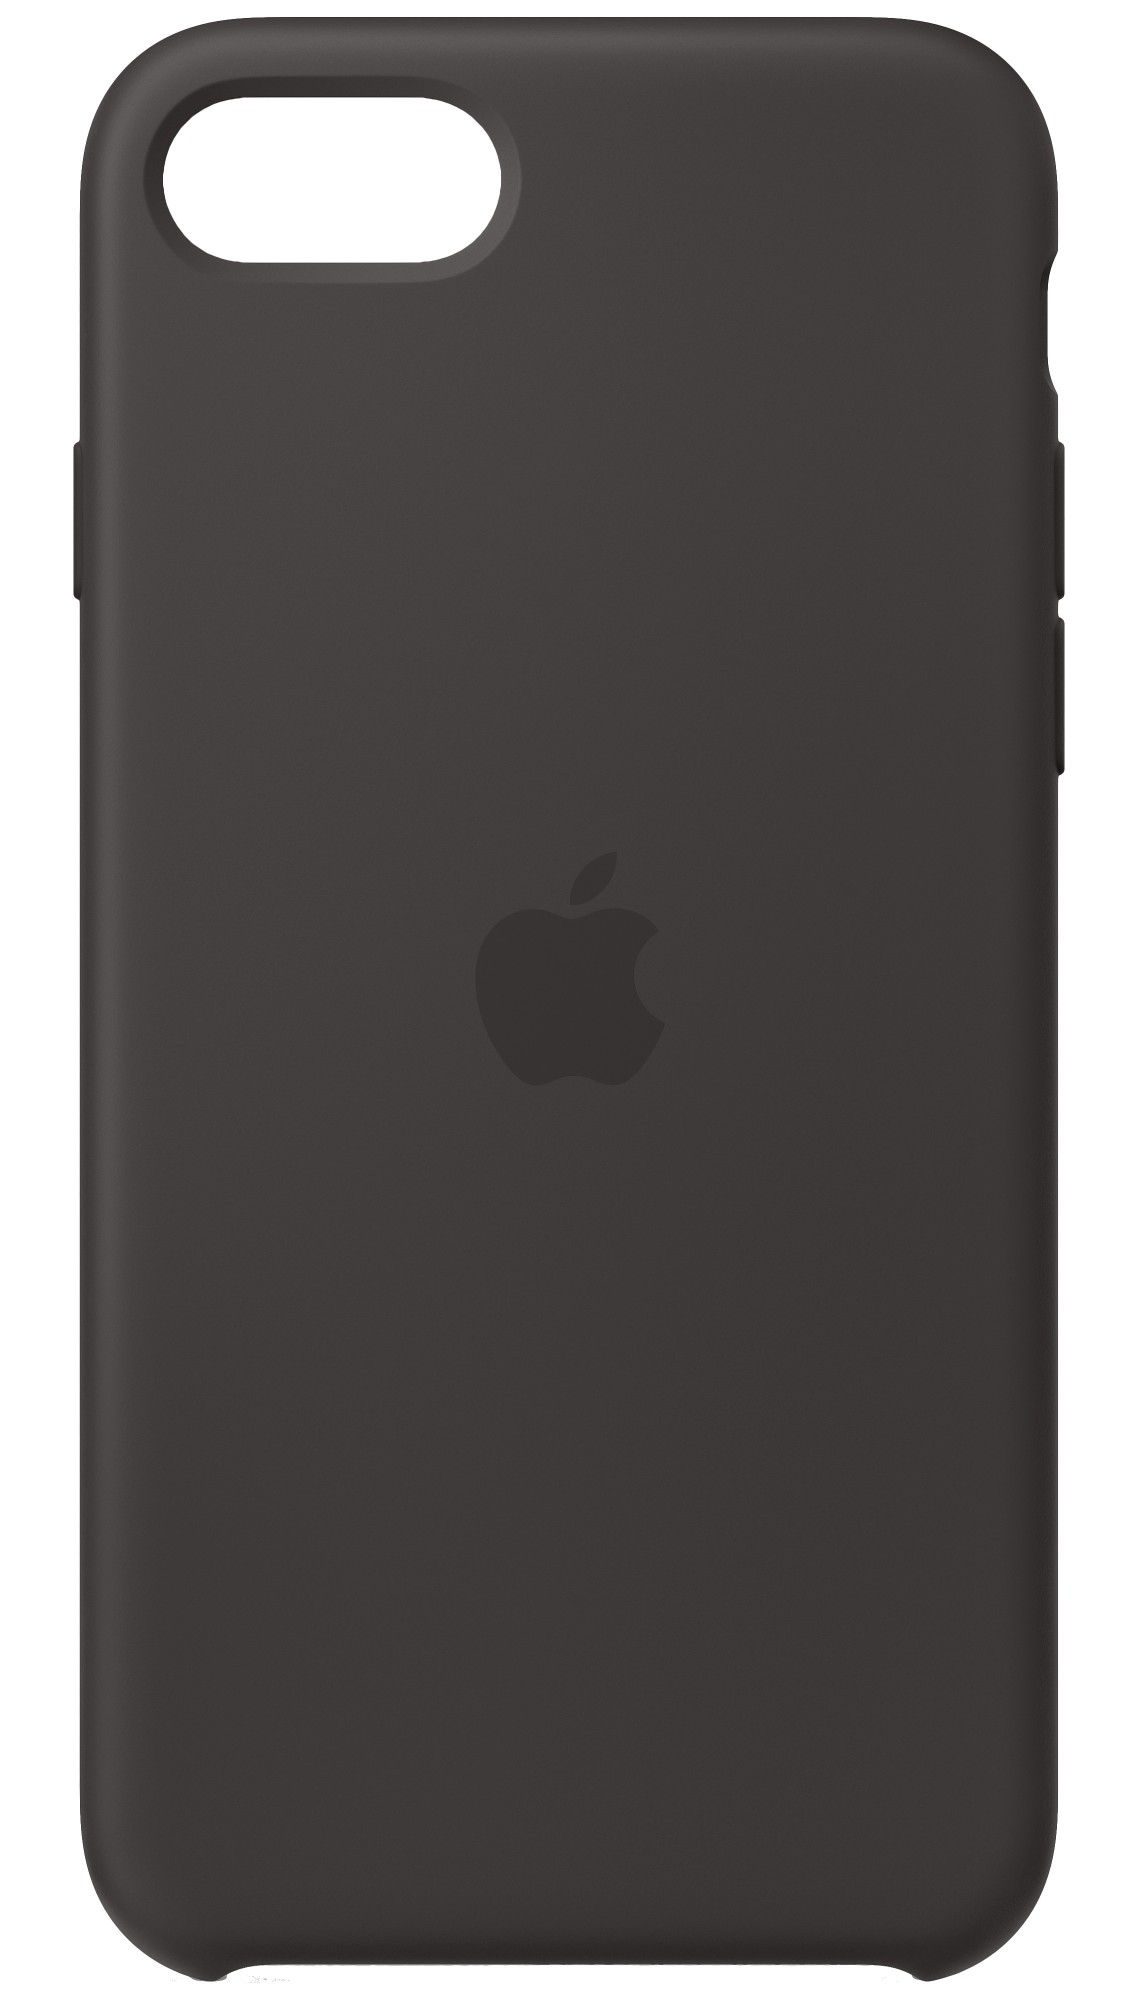 "Apple MXYH2ZM/A funda para teléfono móvil 11,9 cm (4.7"") Negro"